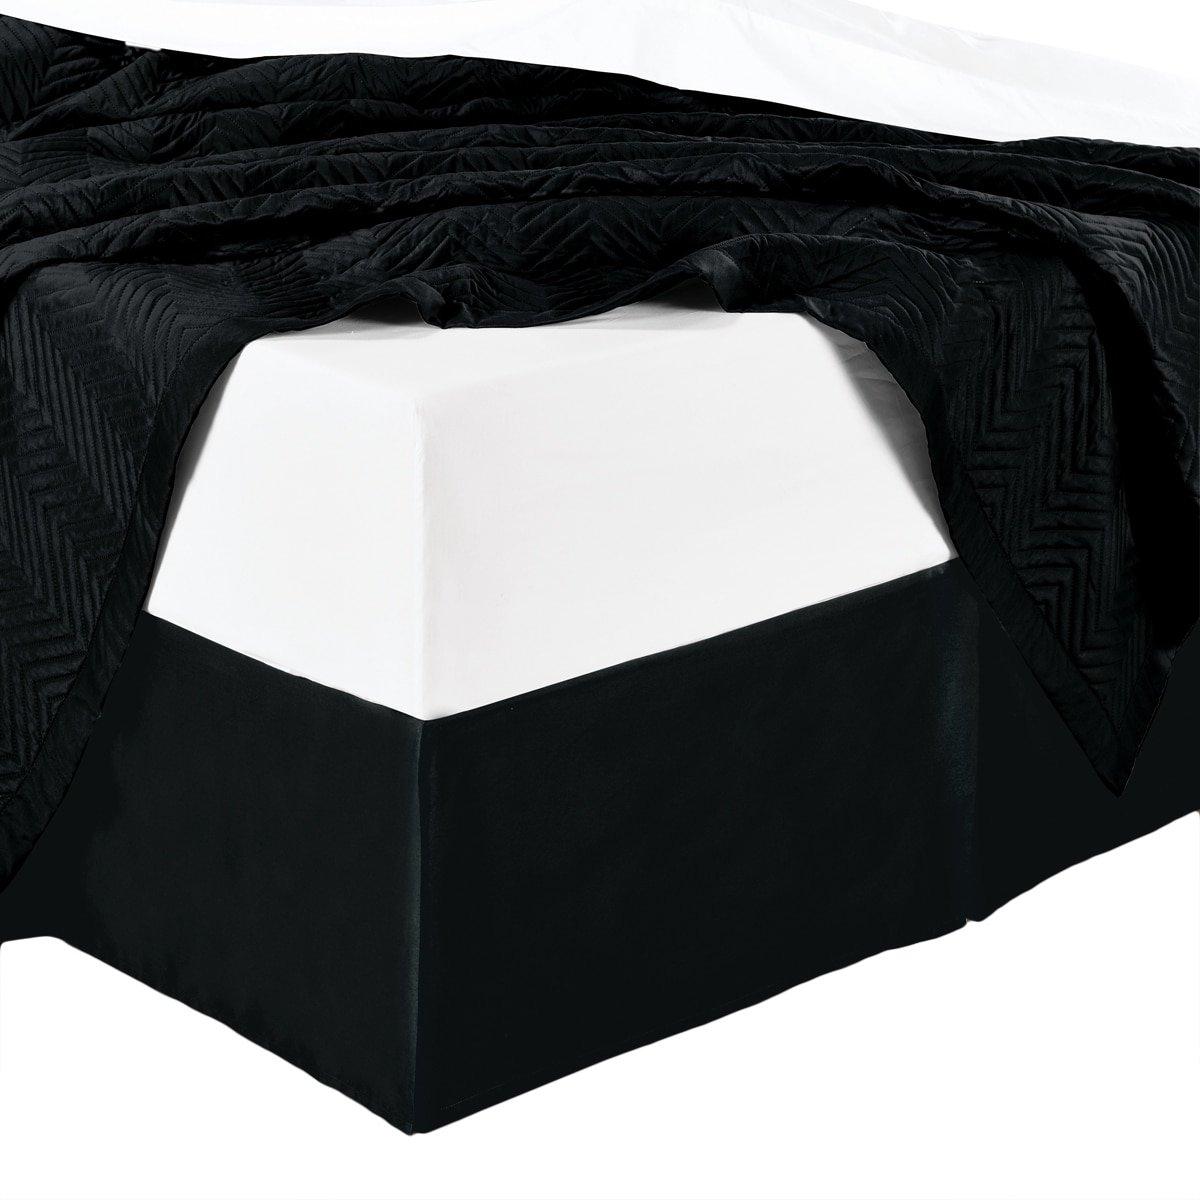 wrinkle-freeソリッドブラックツインサイズプリーツ仕立て14インチdrop- 95 gsm、100 %マイクロファイバーベッドスカート。 B006WSVXC8